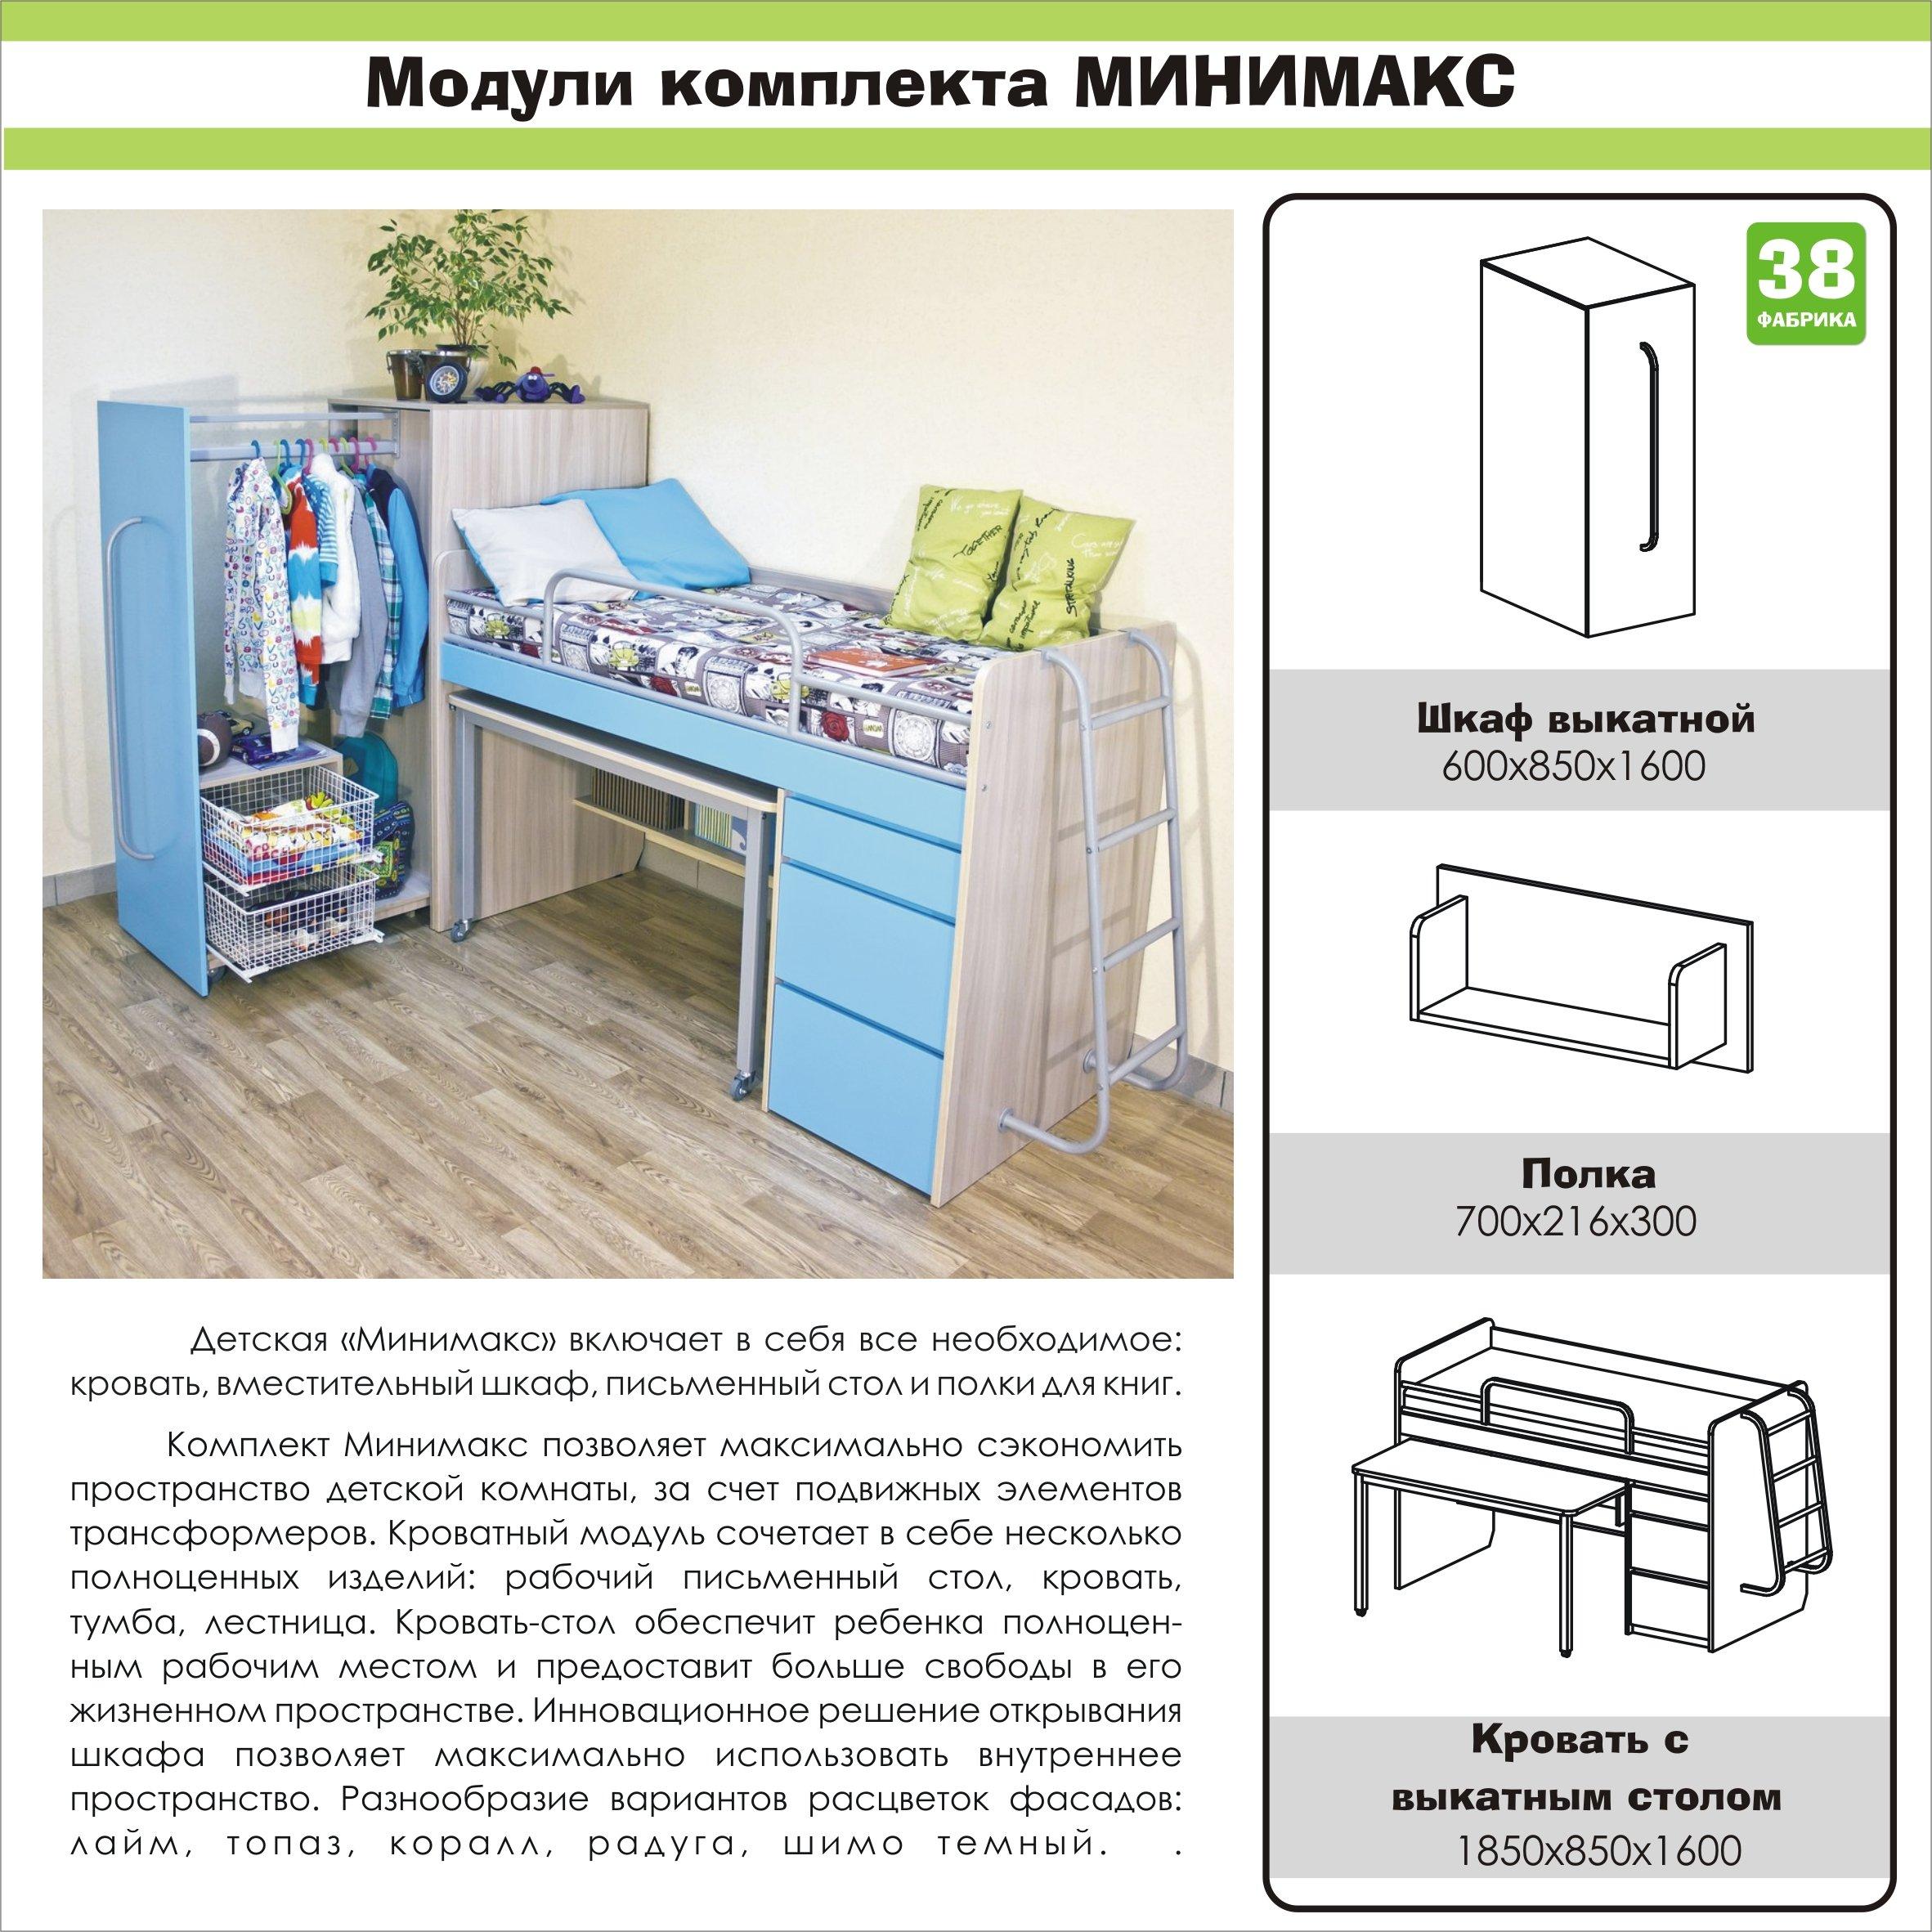 http://online-magazin-mebeli.ru/images/upload/Минимакс%20листовкастр.%202-1.jpg